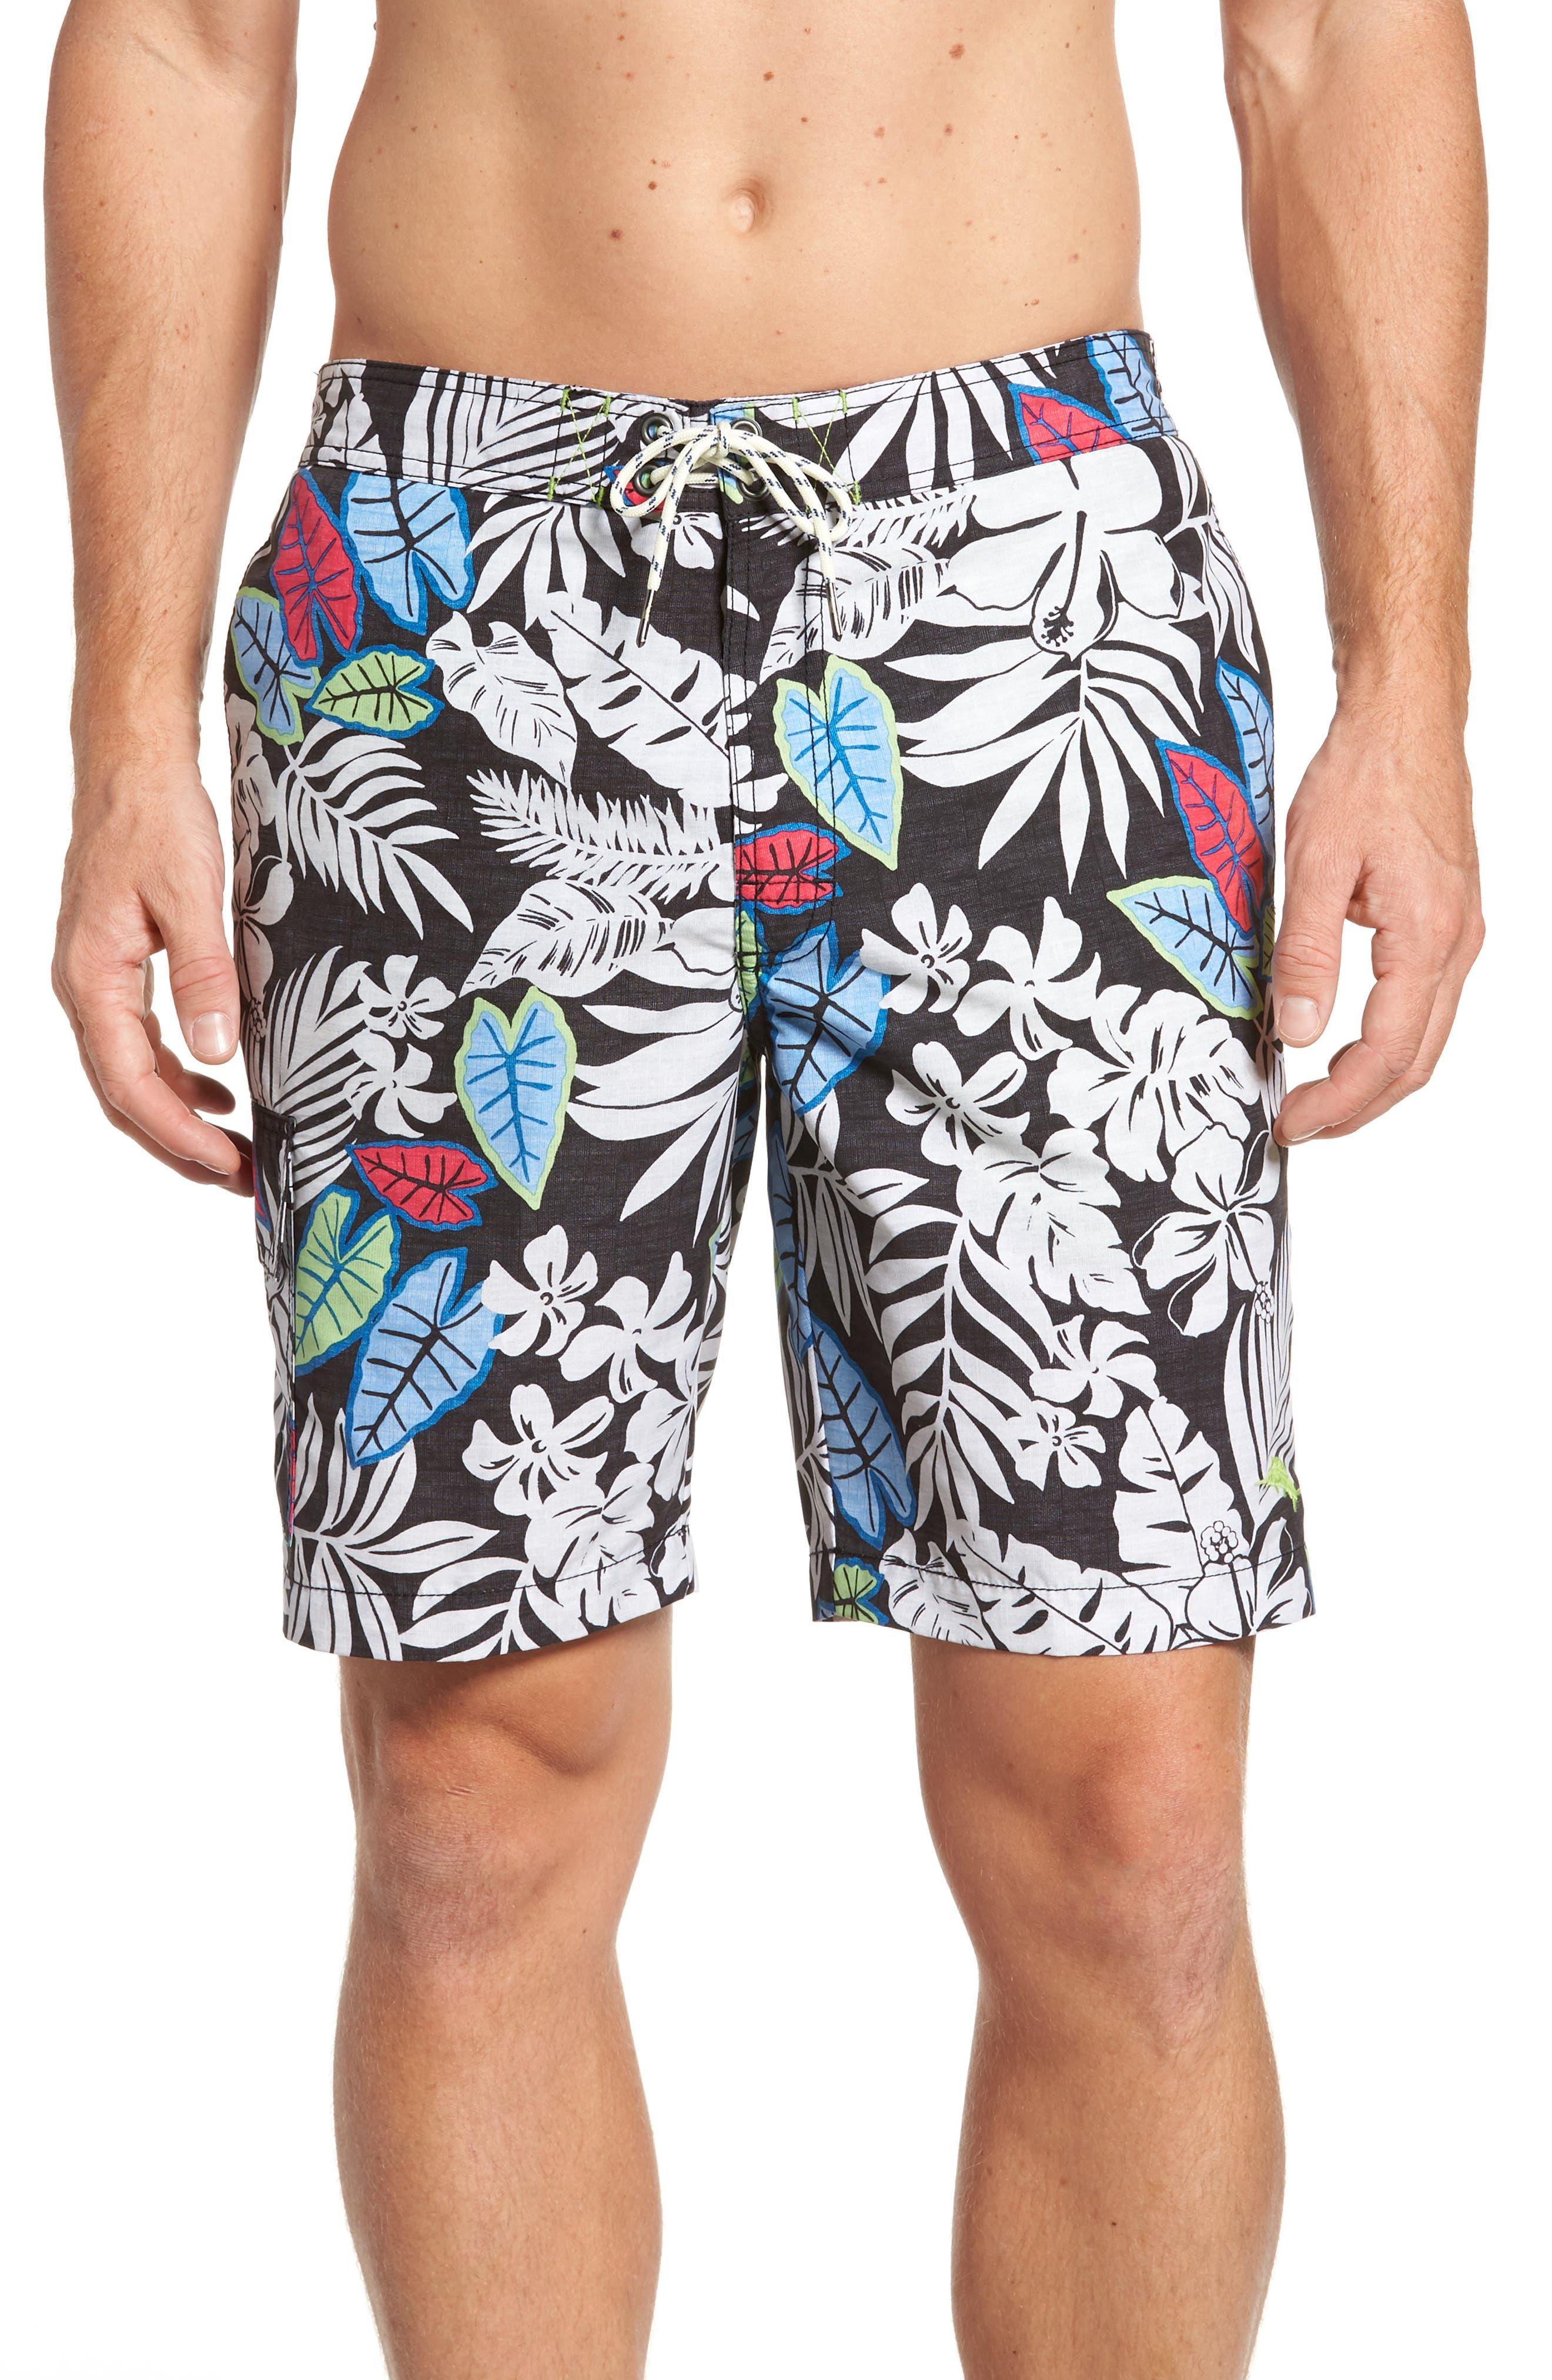 Alternate Image 1 Selected - Tommy Bahama Baja Luau Leaves Board Shorts